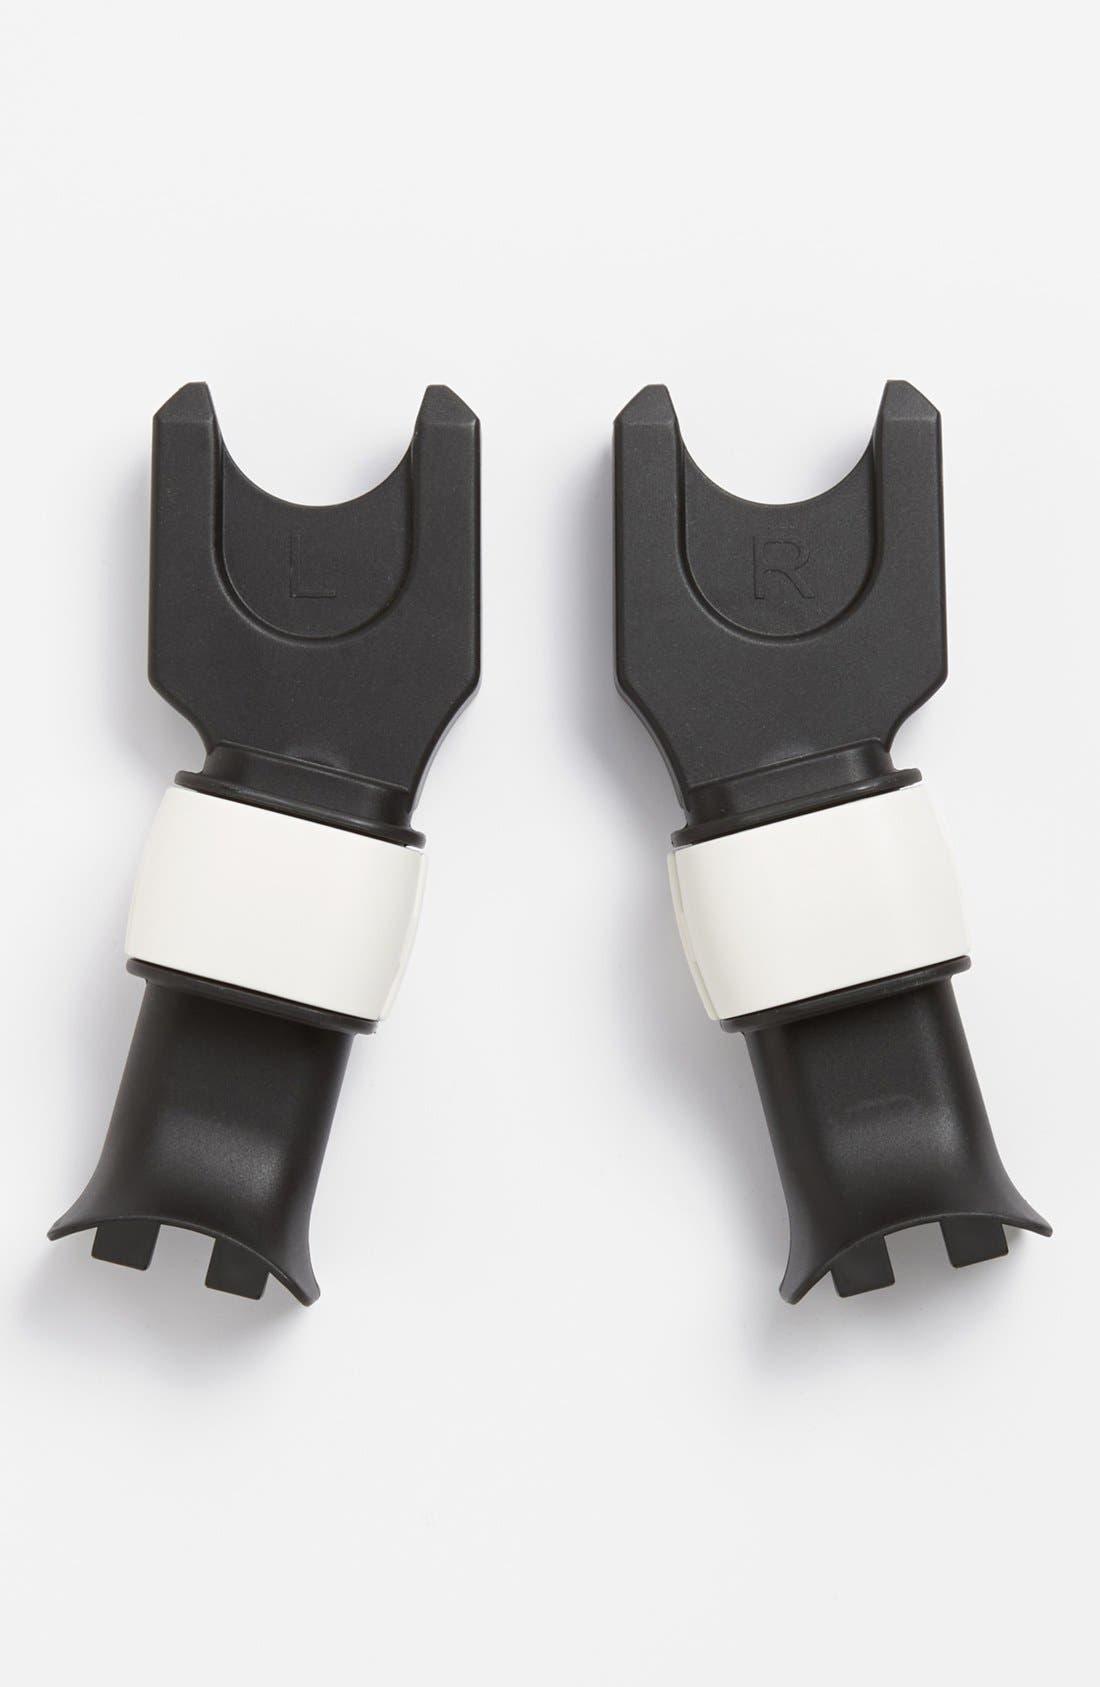 Bugaboo 'Cameleon' Maxi-Cosi® Car Seat Adaptors